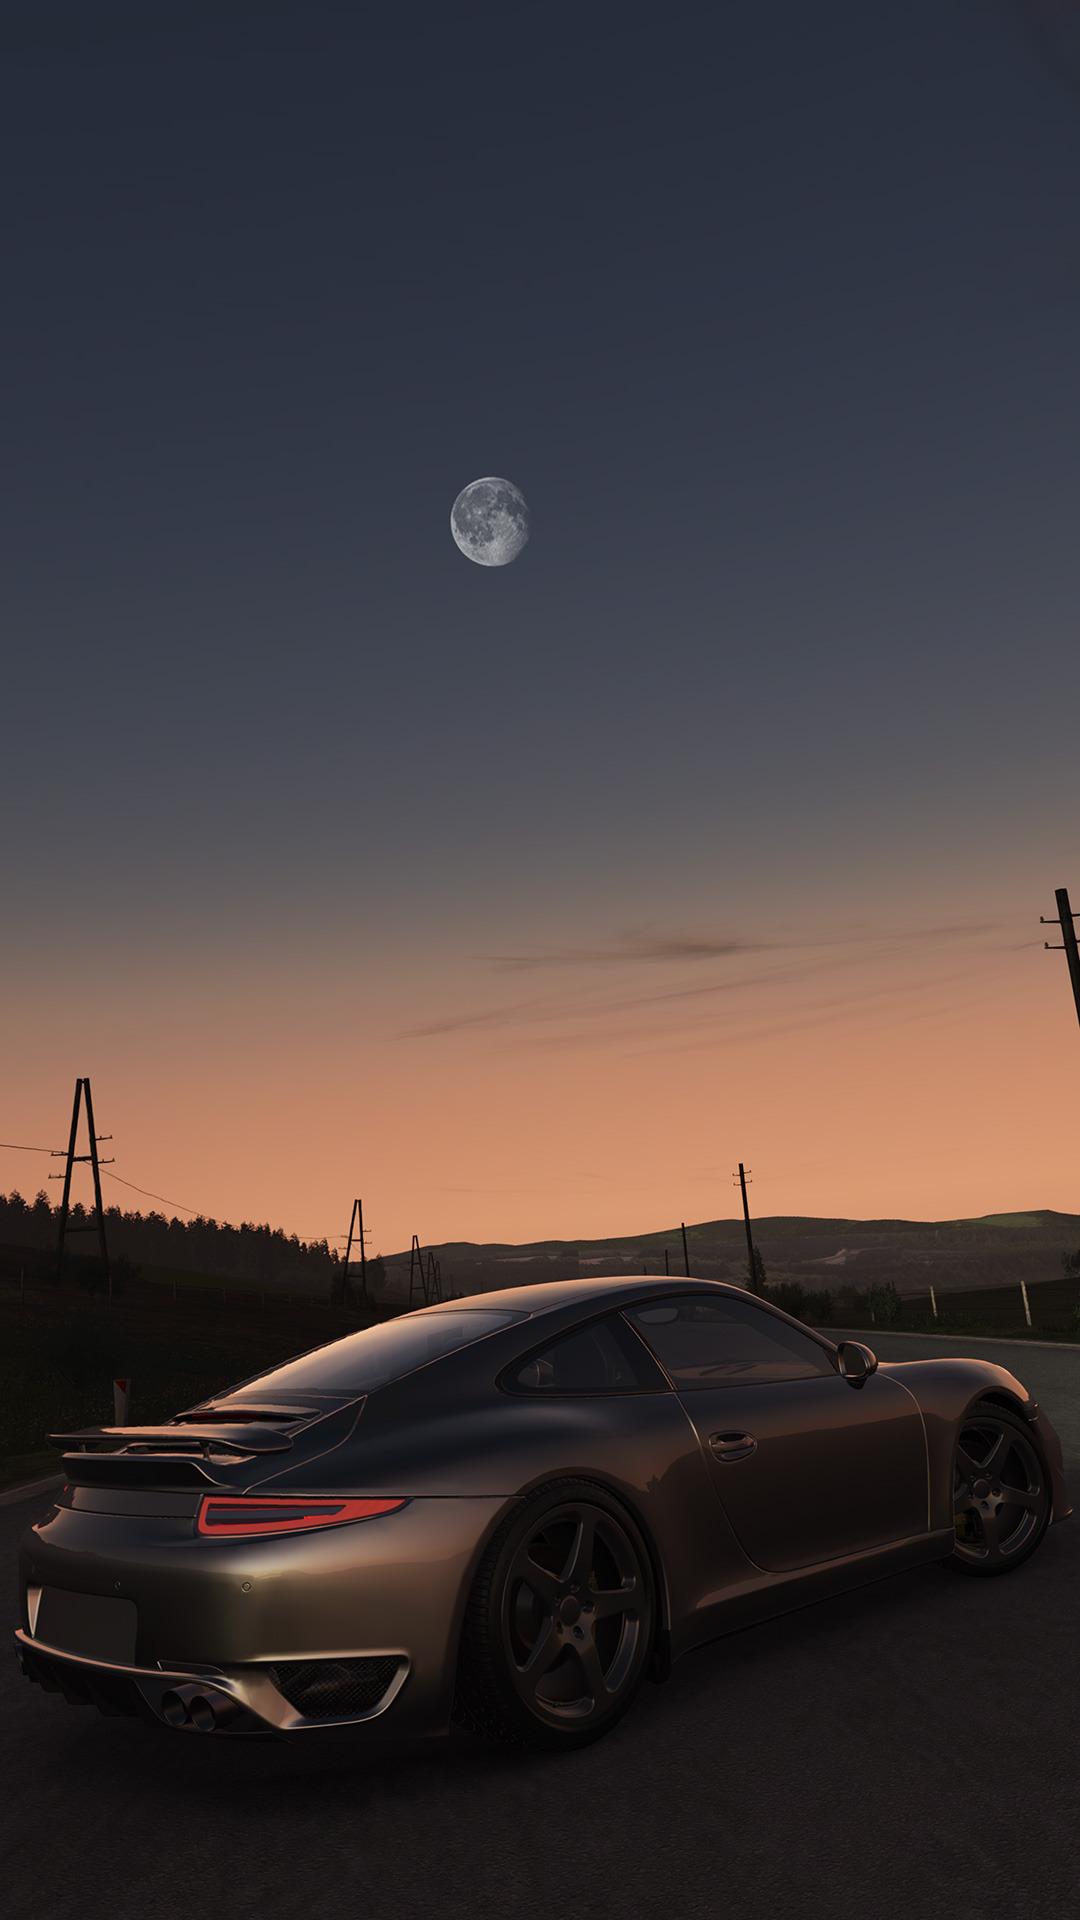 Free Download Car Iphone 6 Plus Wallpapers Porsche 911